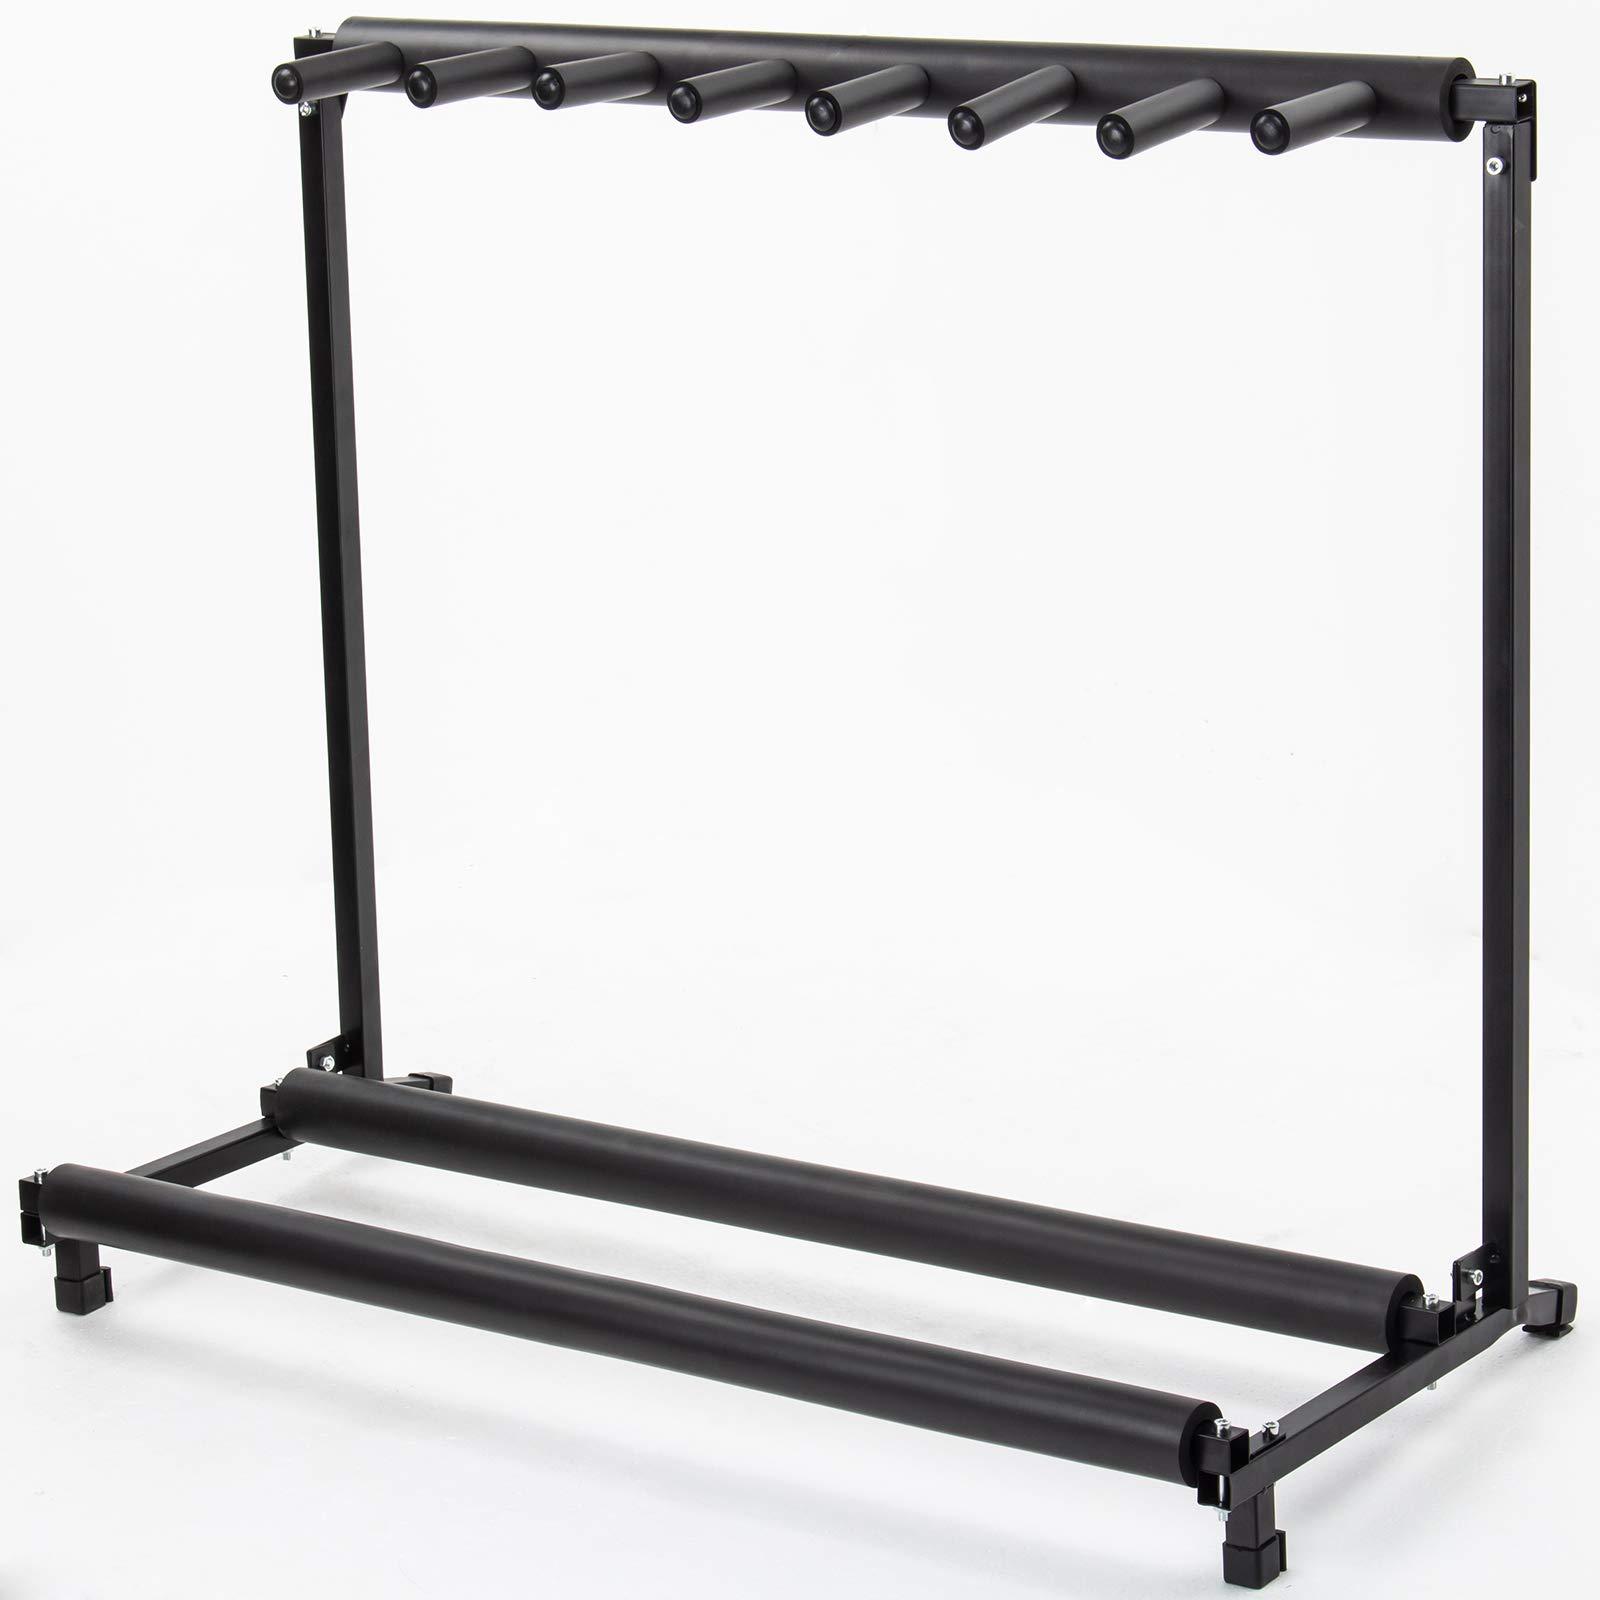 AJO Multi Guitar Stand,7 Holder Guitar Folding Portable Storage Organization Stand Display Rack,Black by AJO (Image #2)